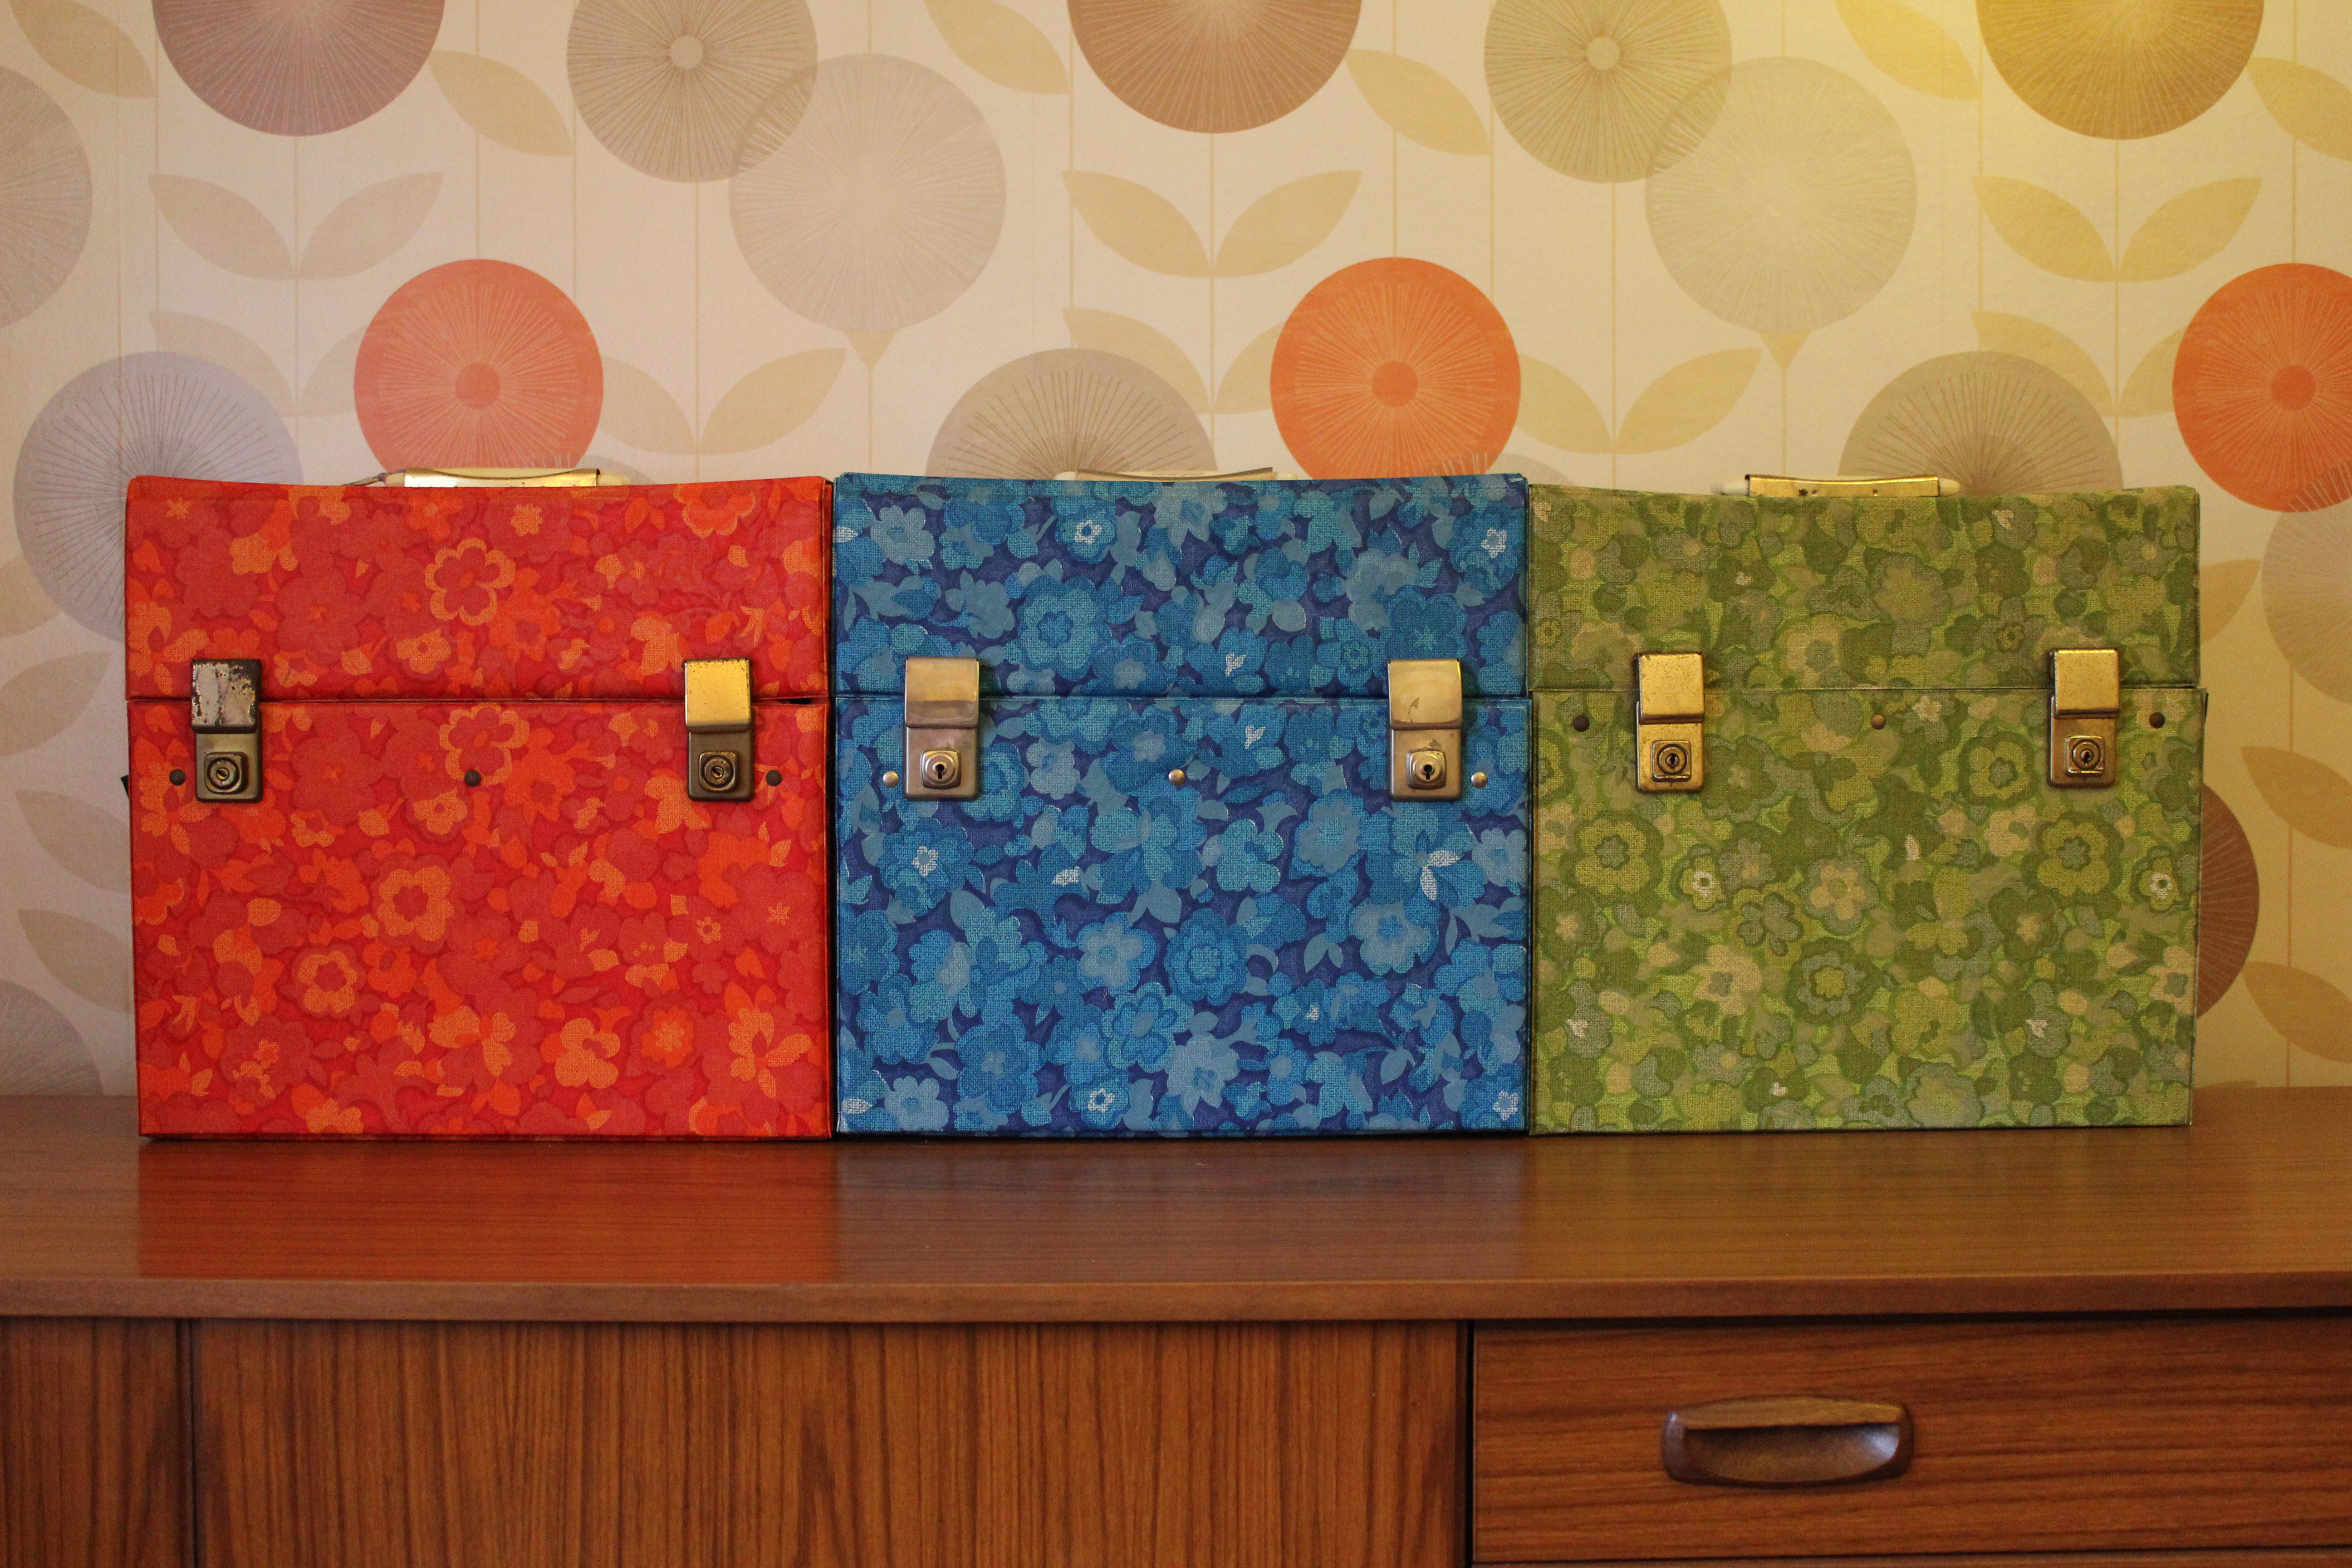 Retro living room interior design record lp storage cases for Retro 60s bedroom ideas